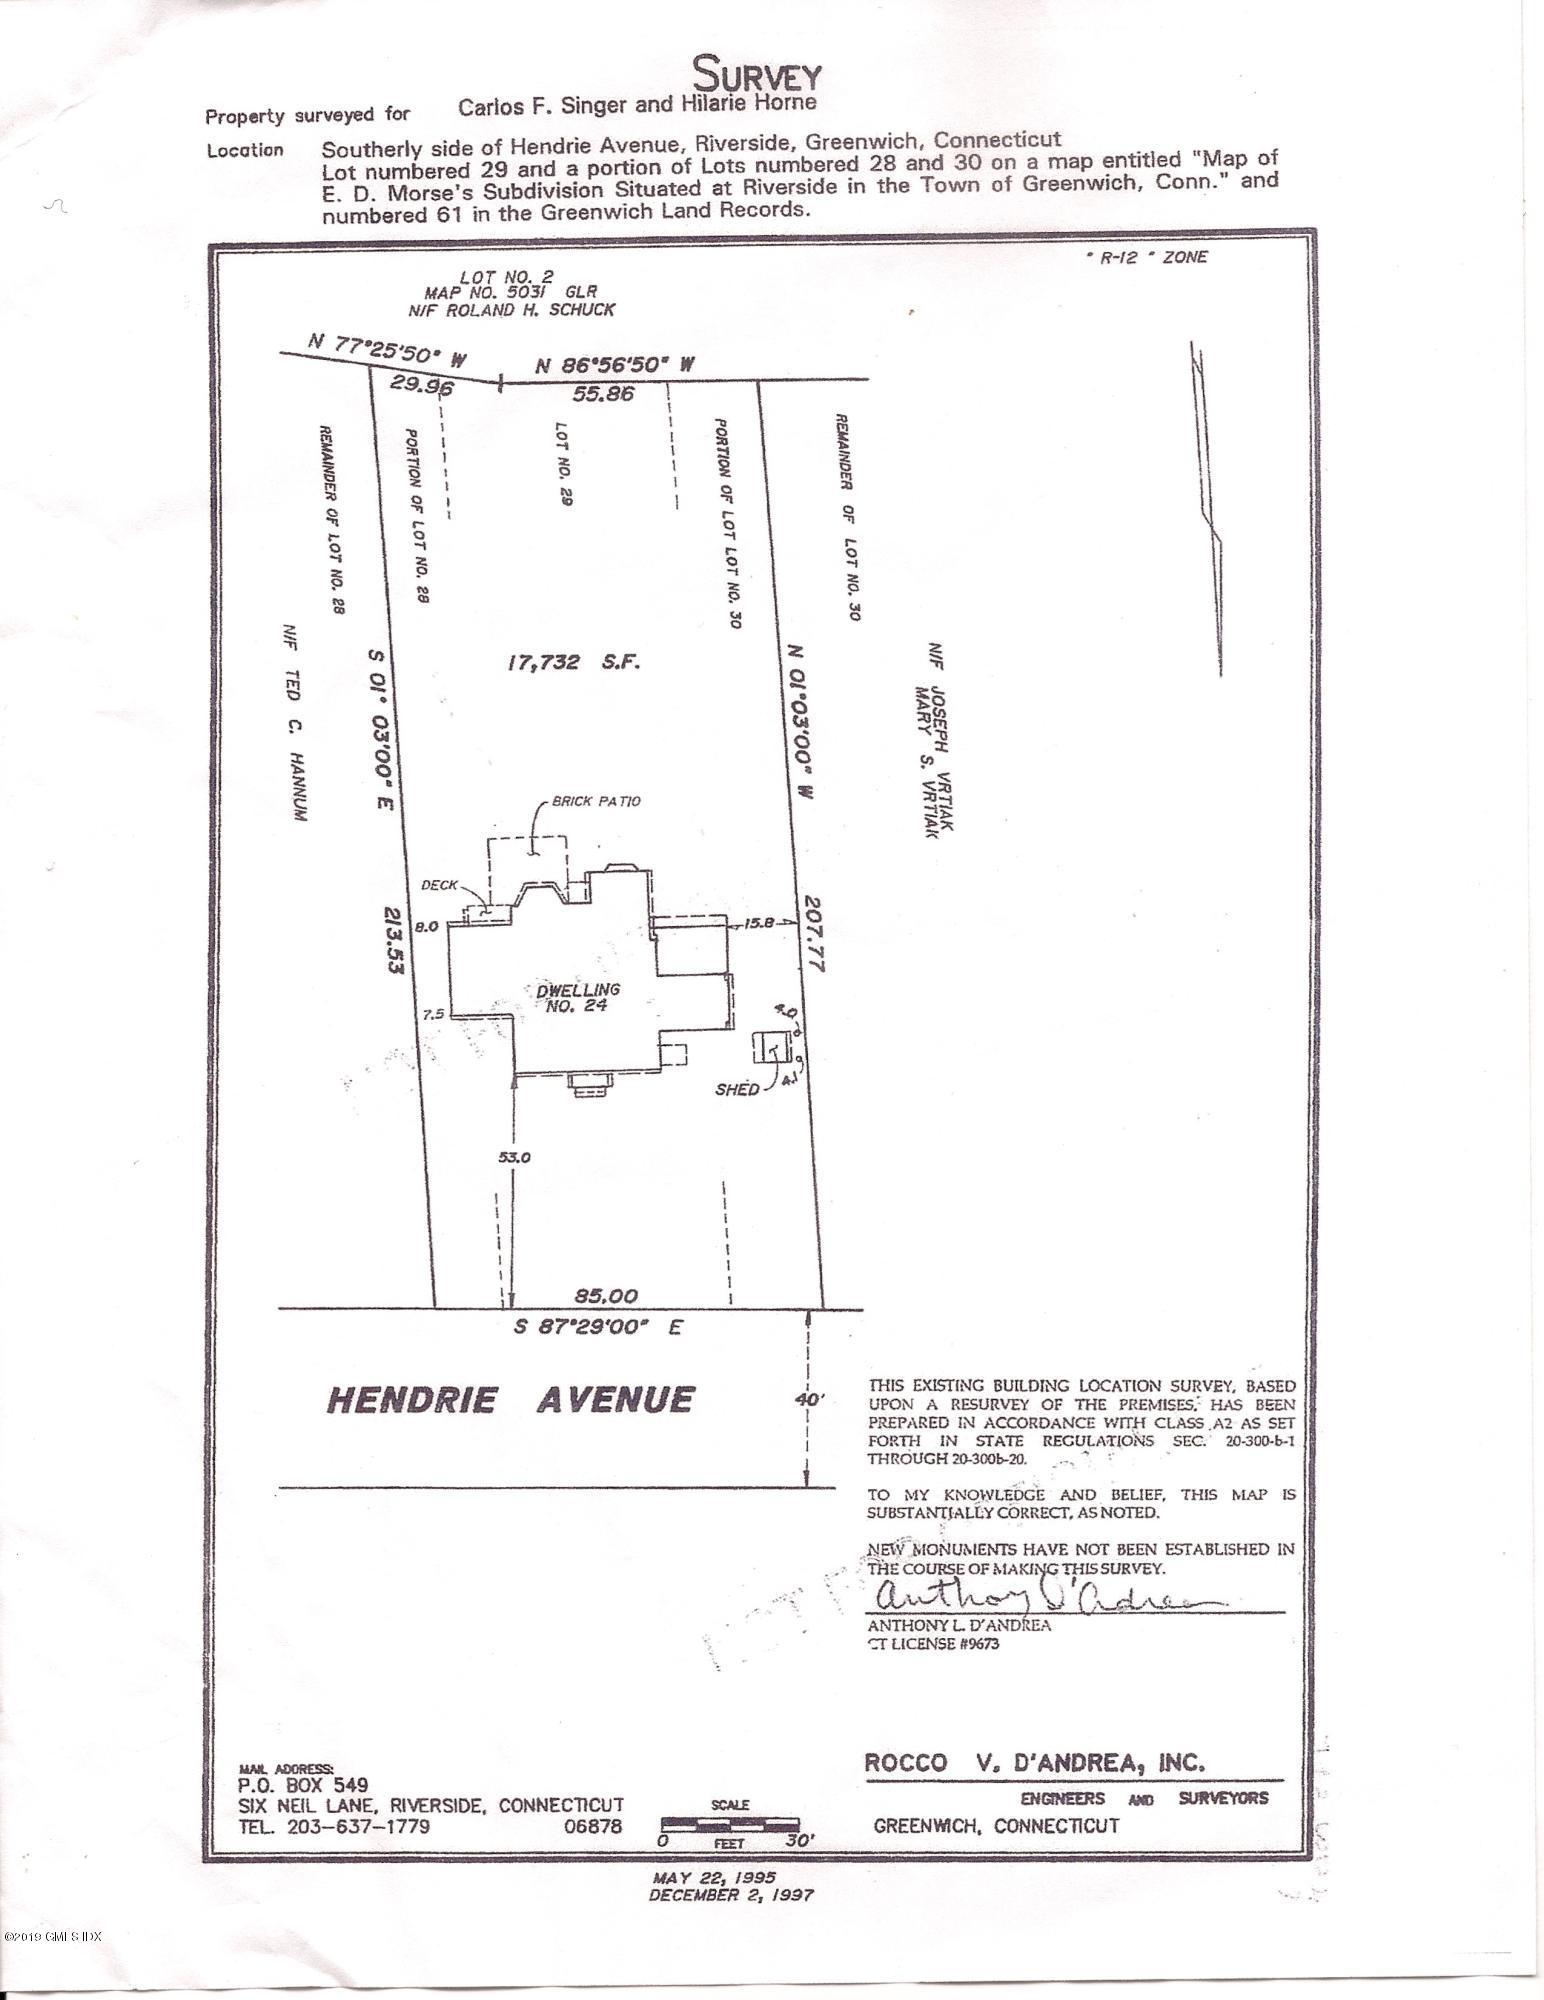 24 Hendrie Avenue, Riverside, CT 06878